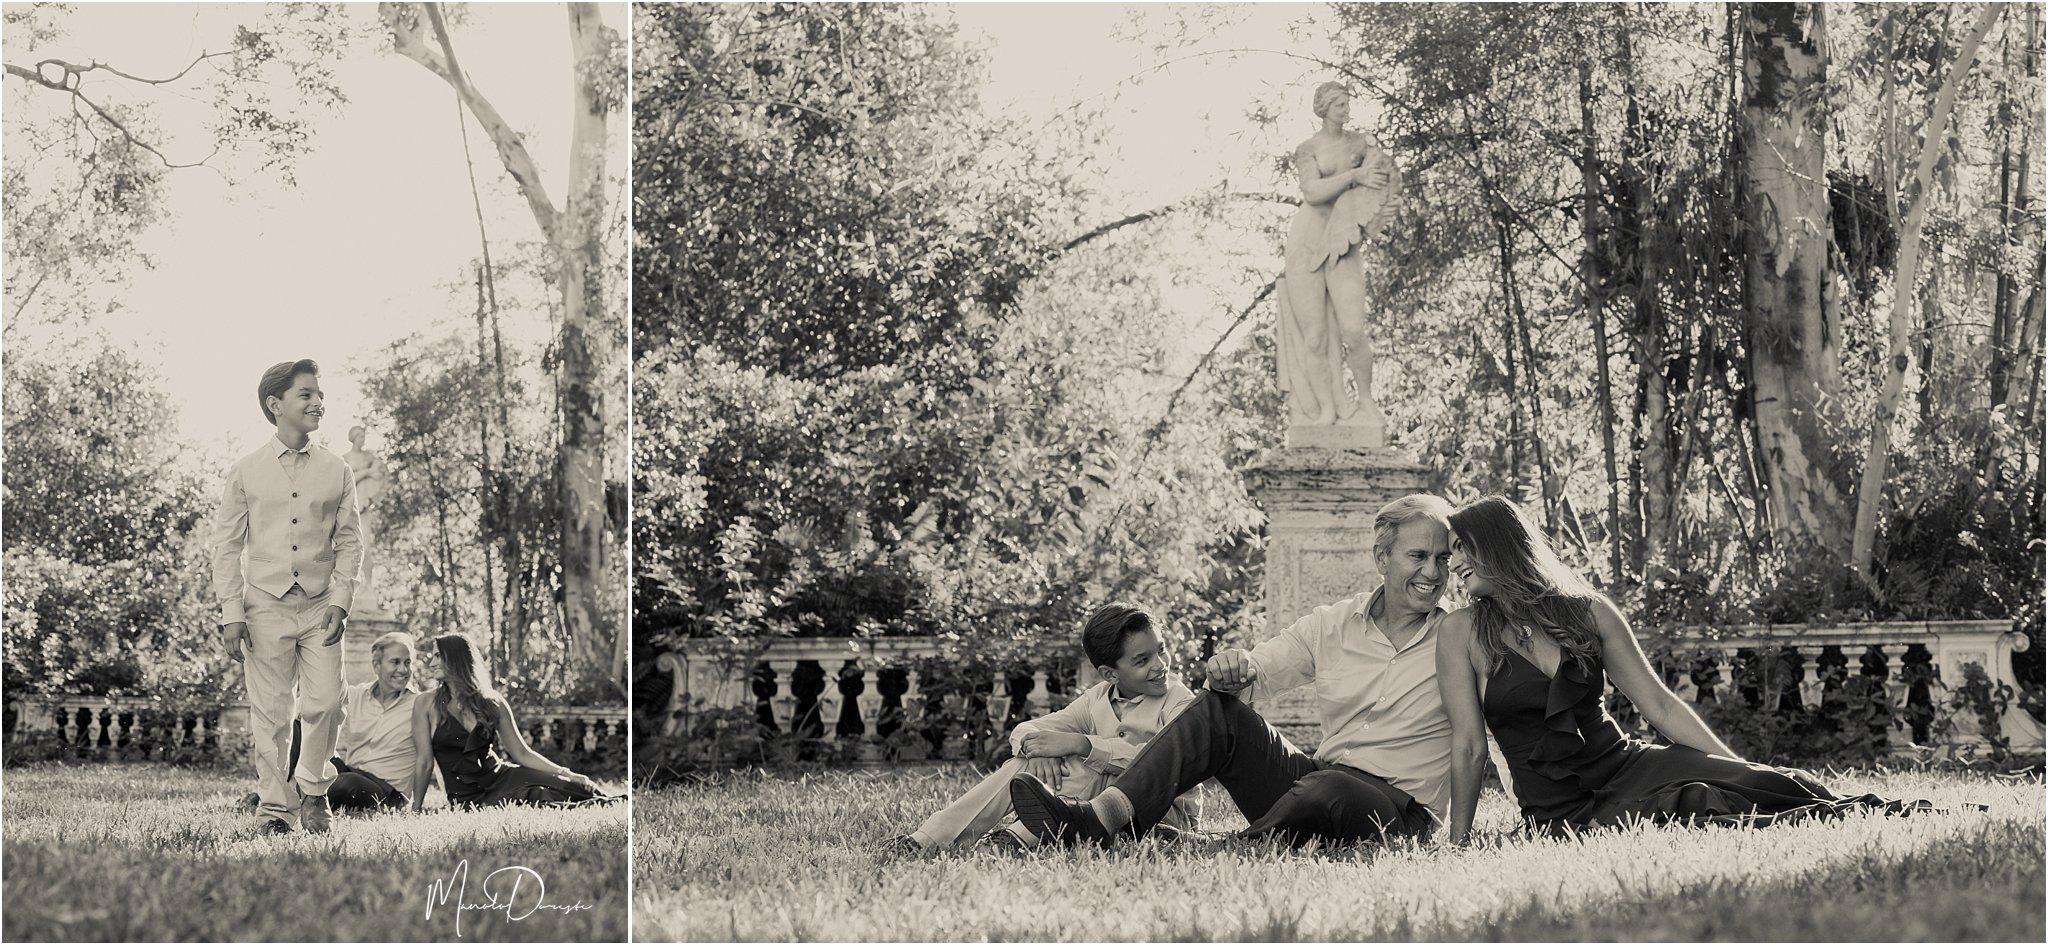 0075_ManoloDoreste_InFocusStudios_Wedding_Family_Photography_Miami_MiamiPhotographer.jpg